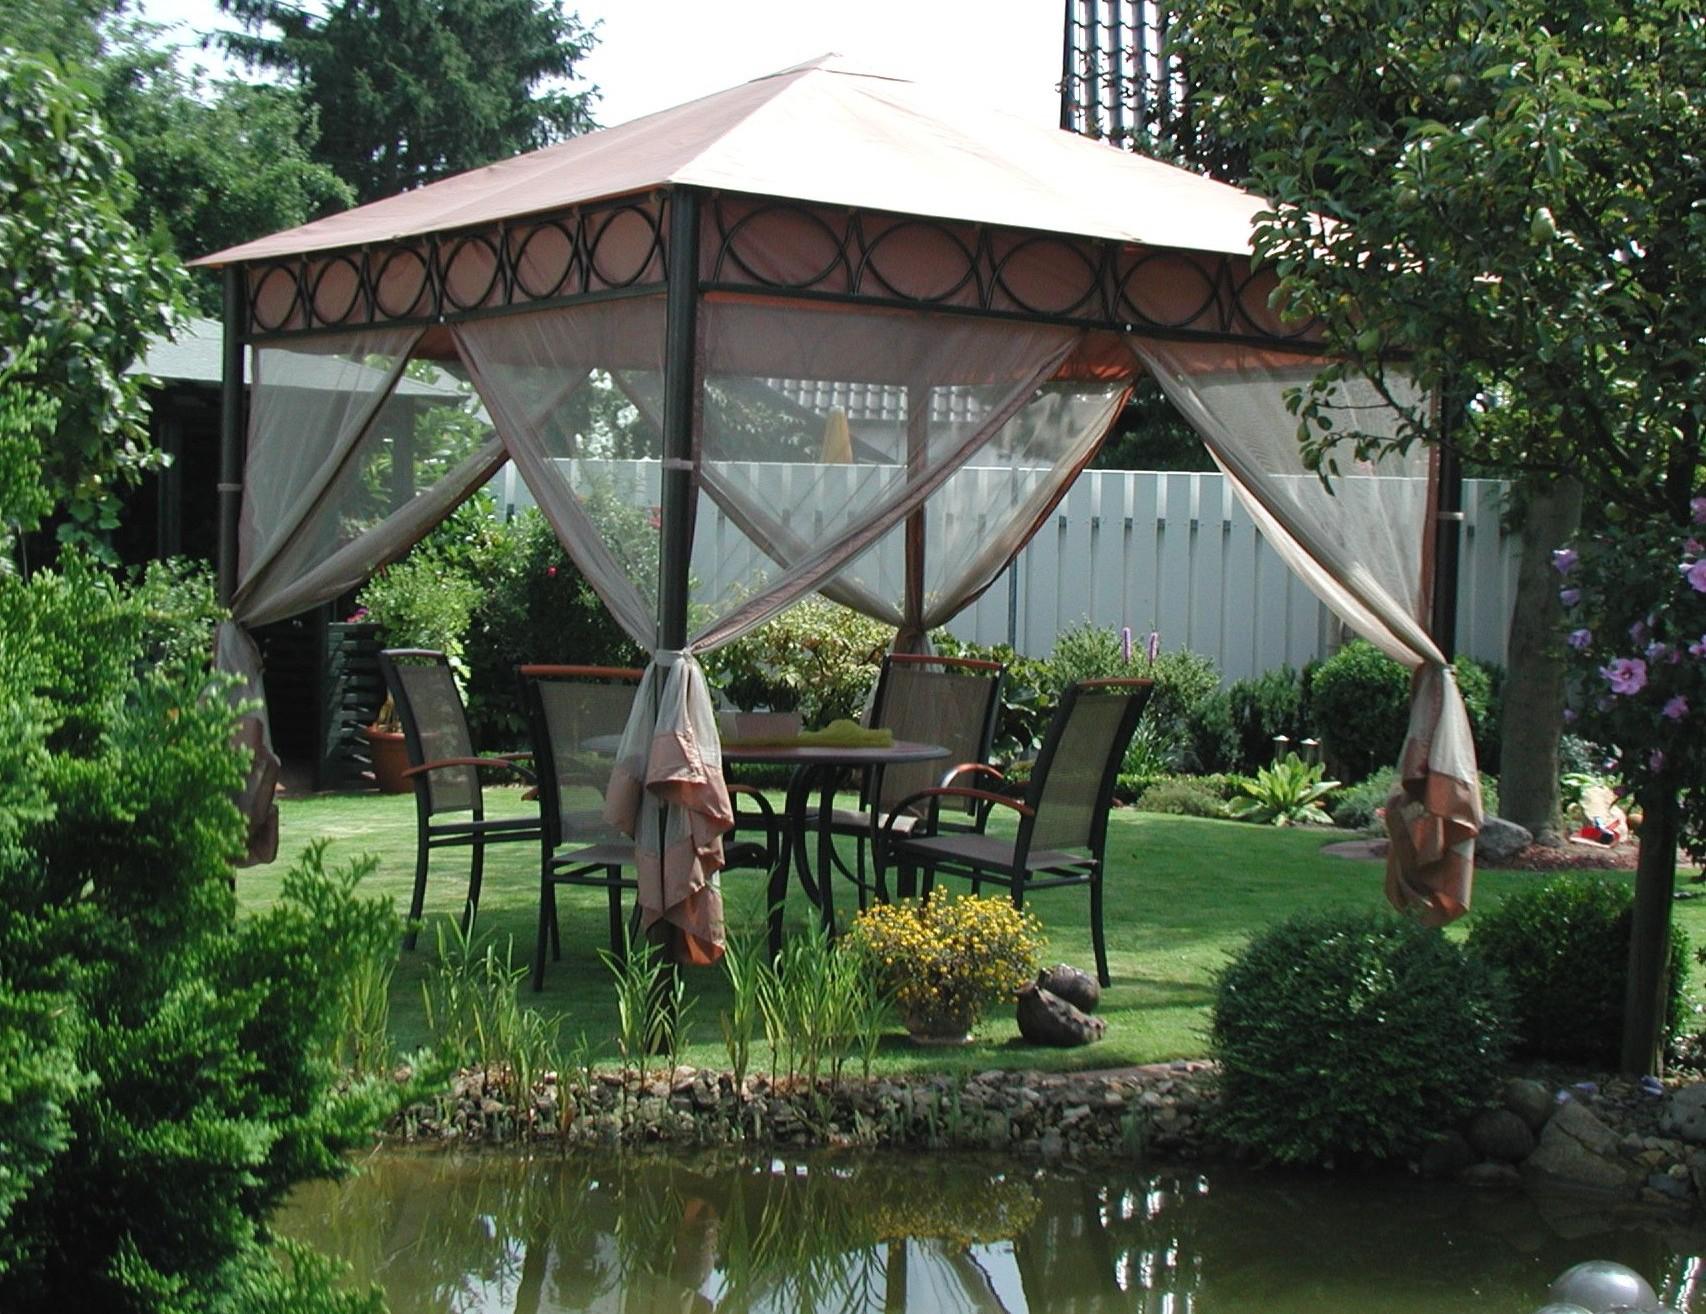 Festzelt Pavillon Design : Design leco pavillon safari m gartenmöbel festzelt partyzelt